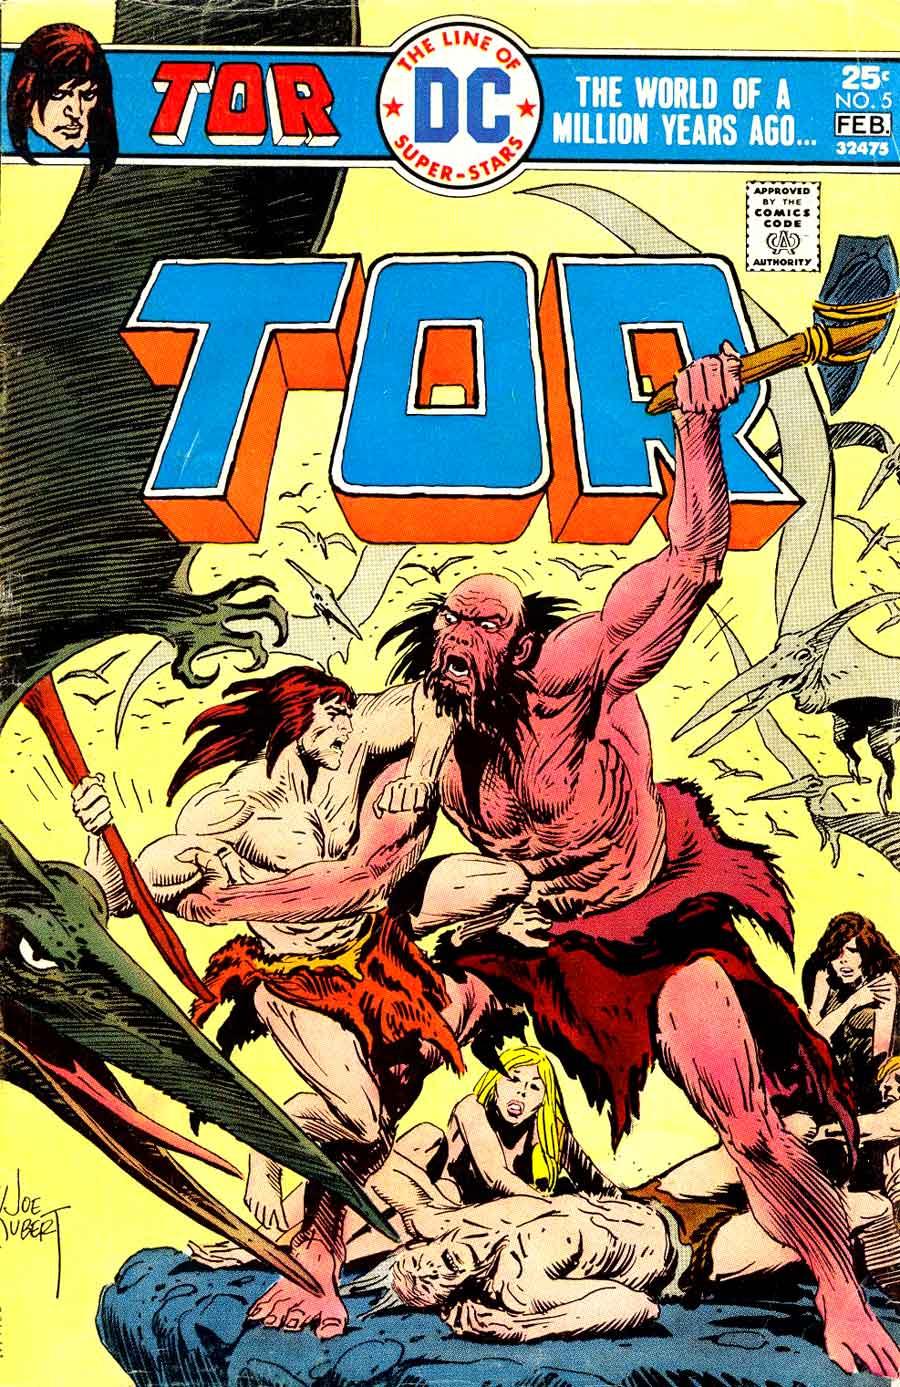 Tor v2 #5 dc bronze age comic book cover art by Joe Kubert